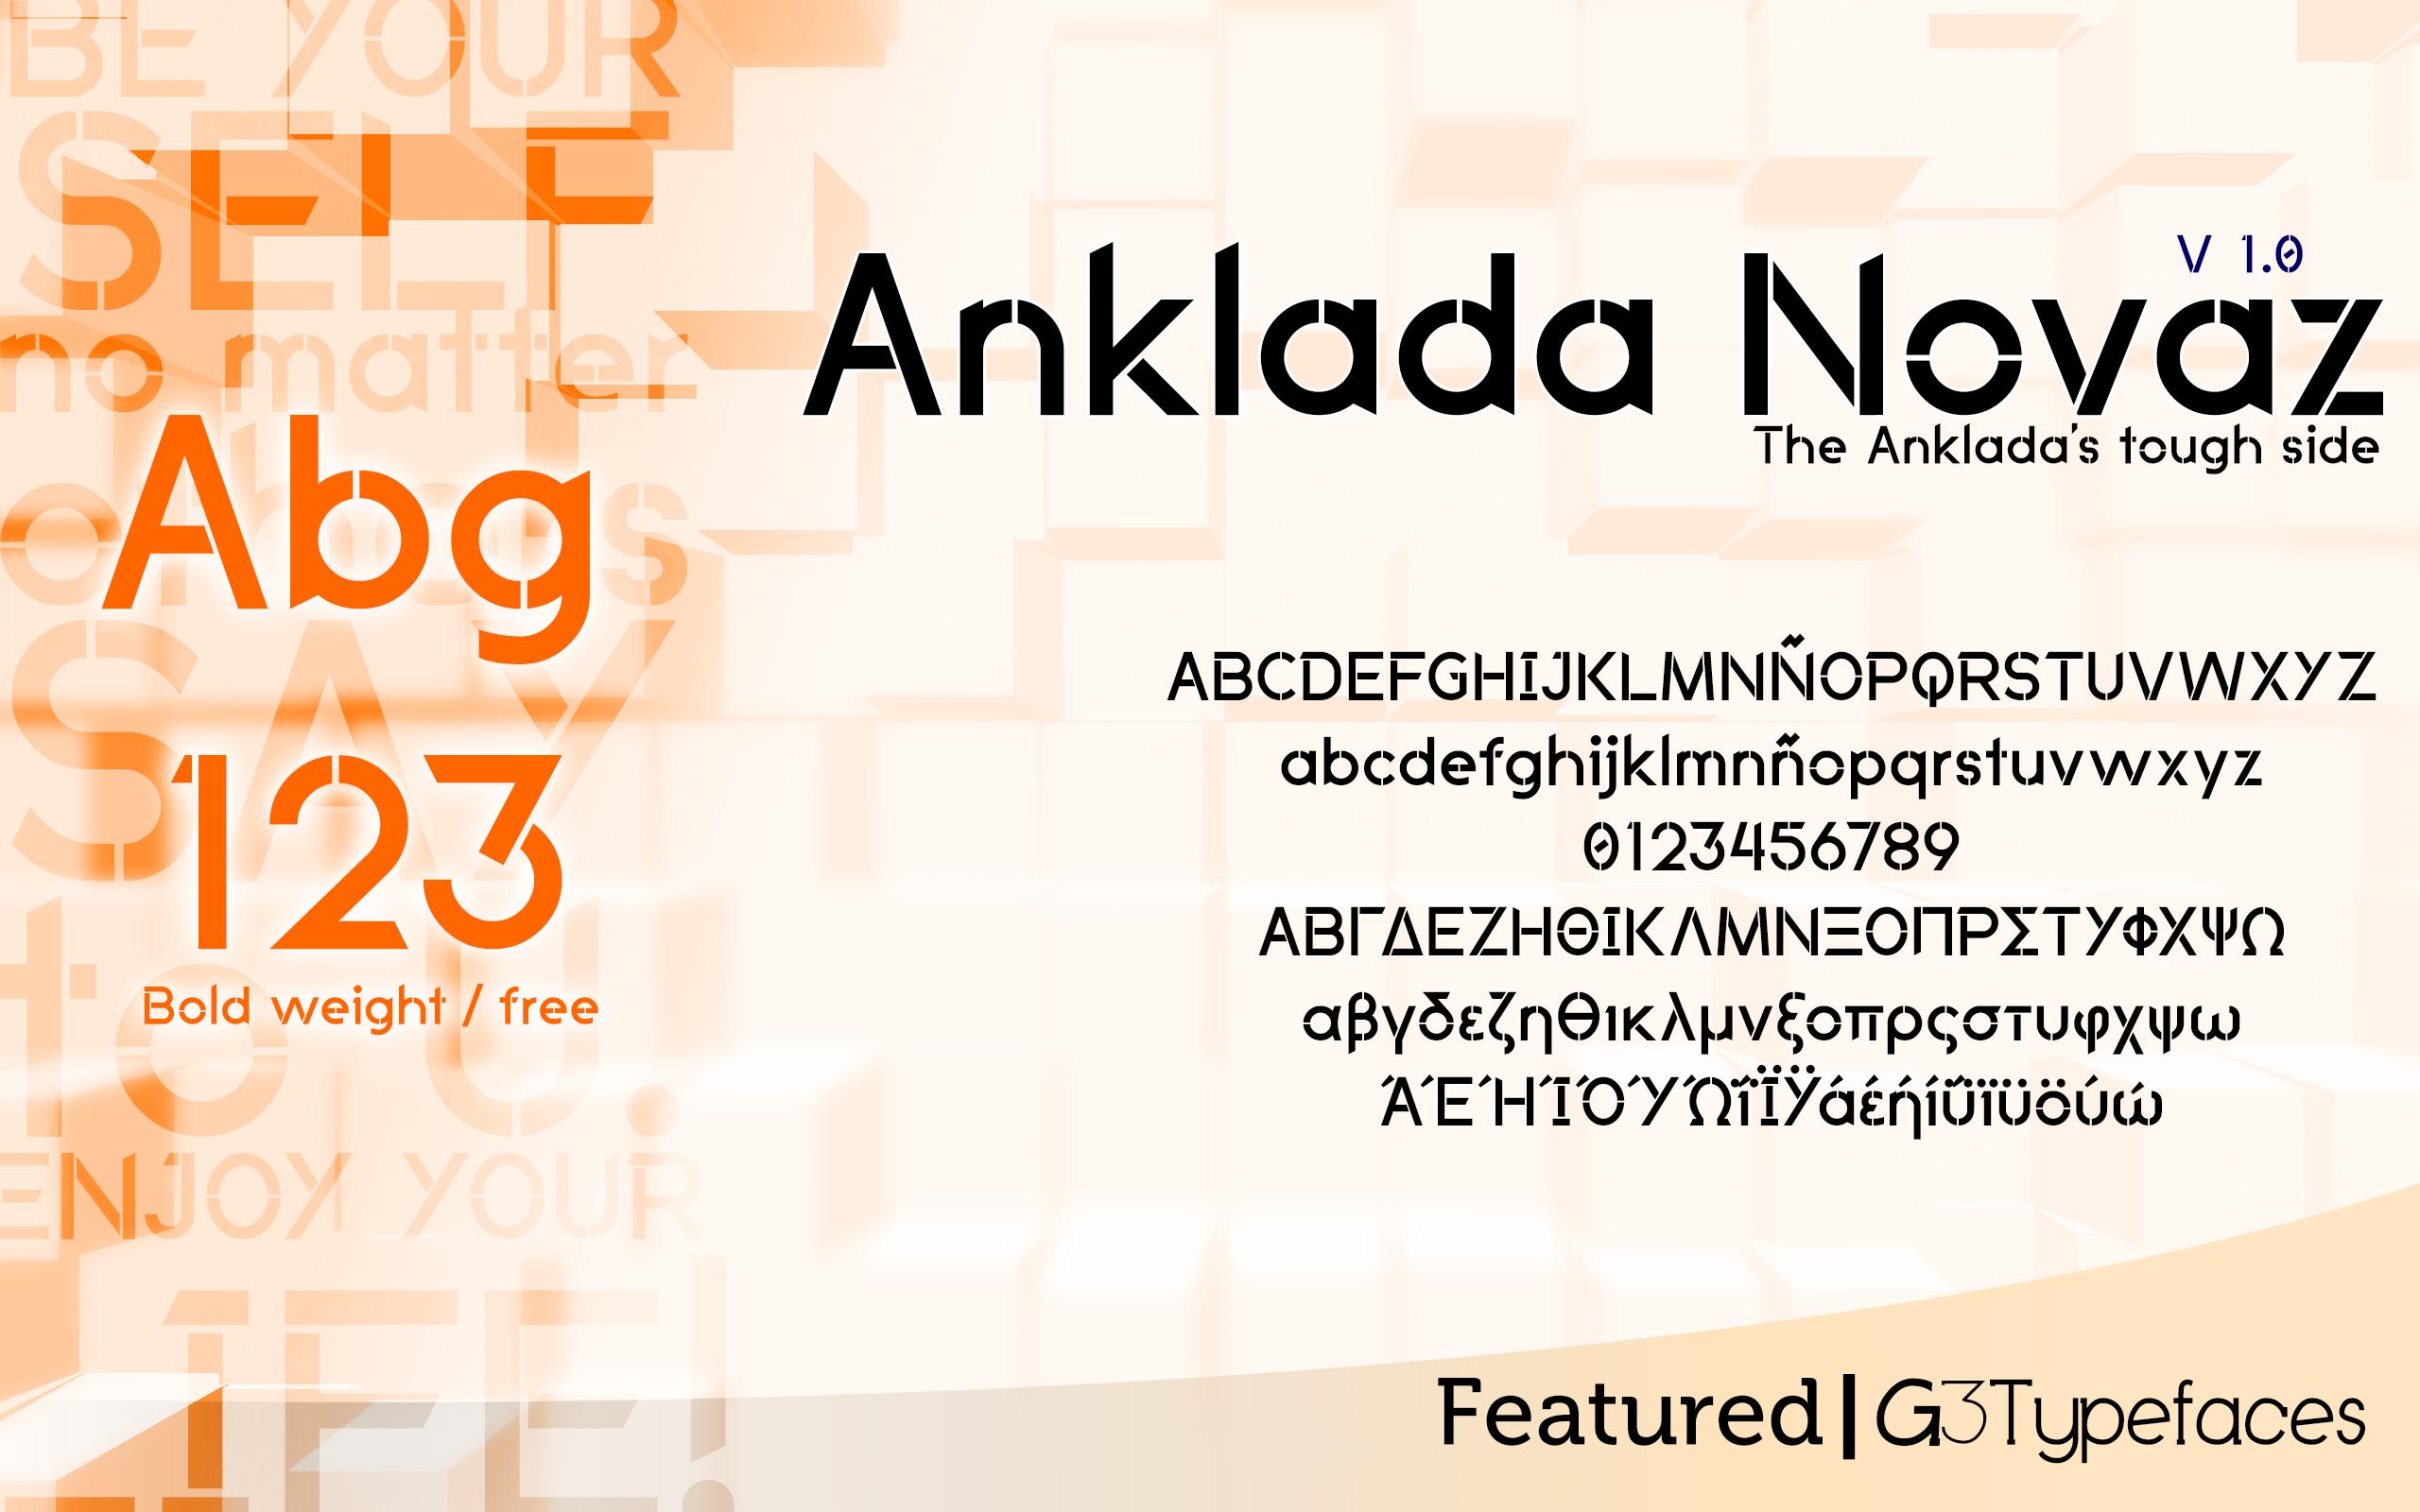 Anklada Novaz by G3Drakoheart-Arts